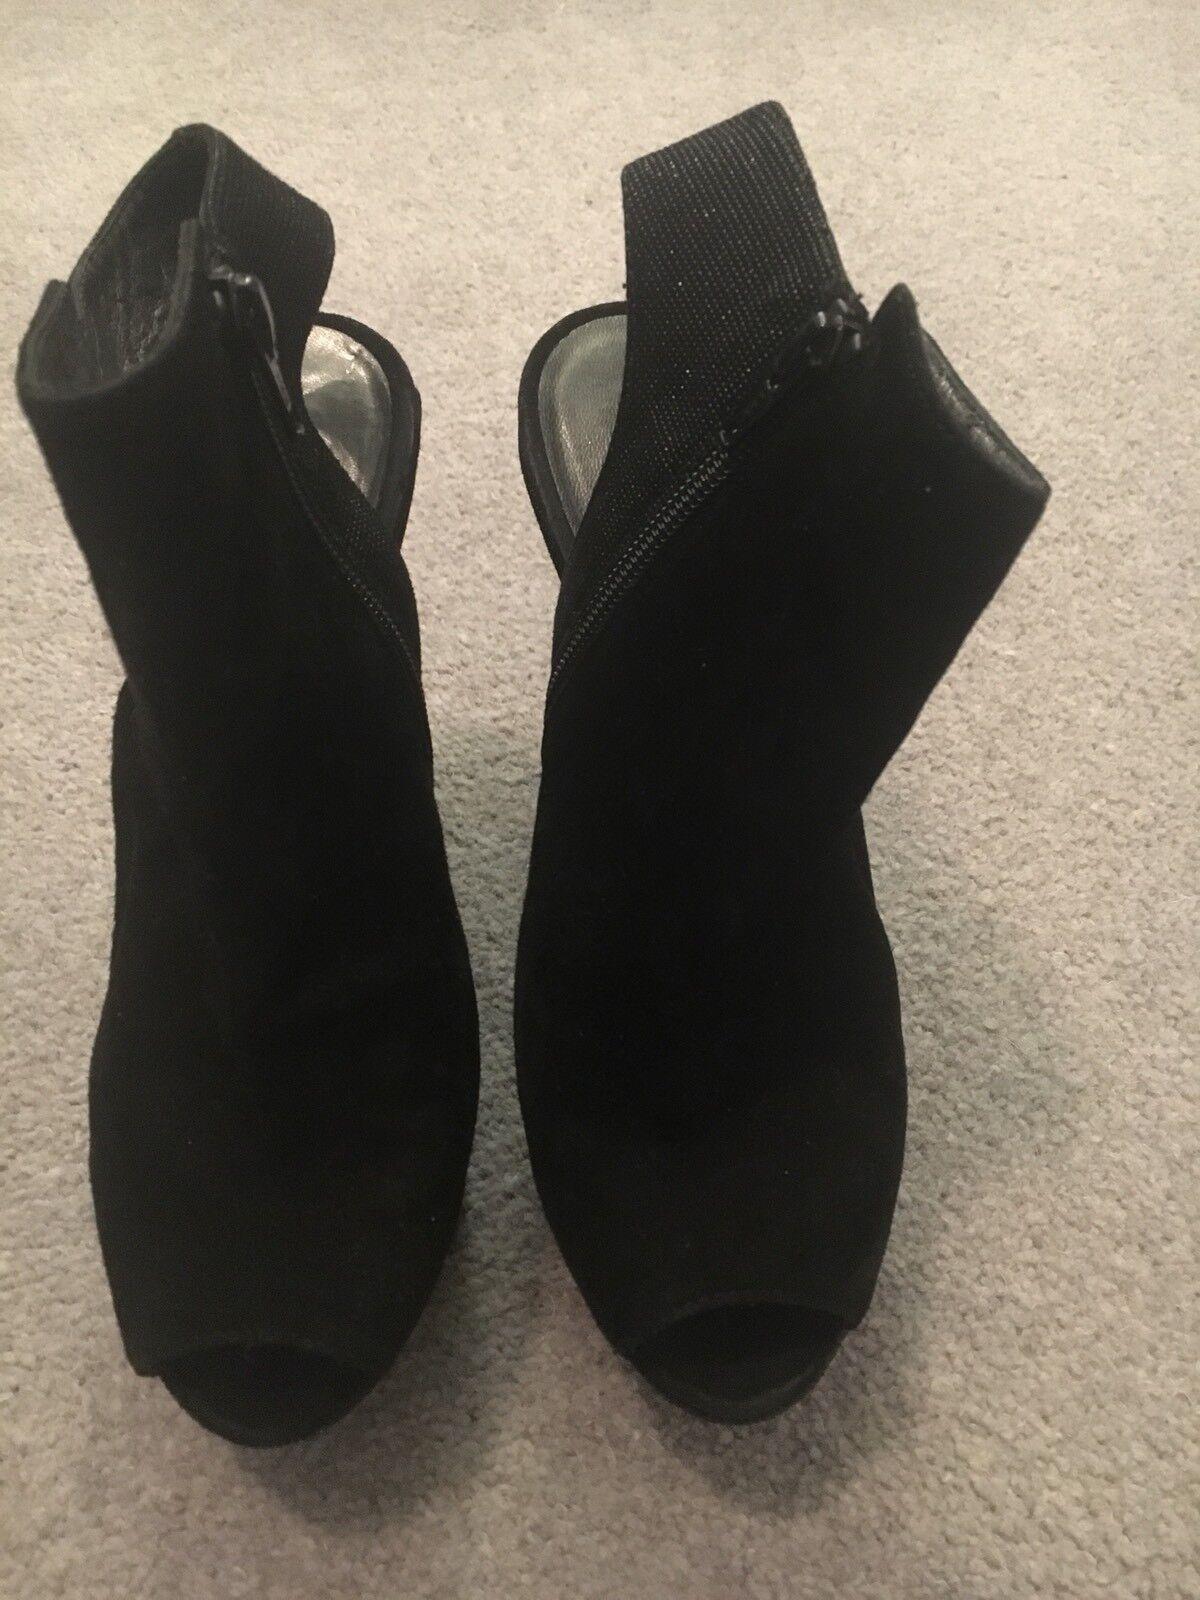 Descuento de liquidación Stuart Weitzman Open Toe Black Suede And Glittery Shoe Boot With Wedge. Size 3